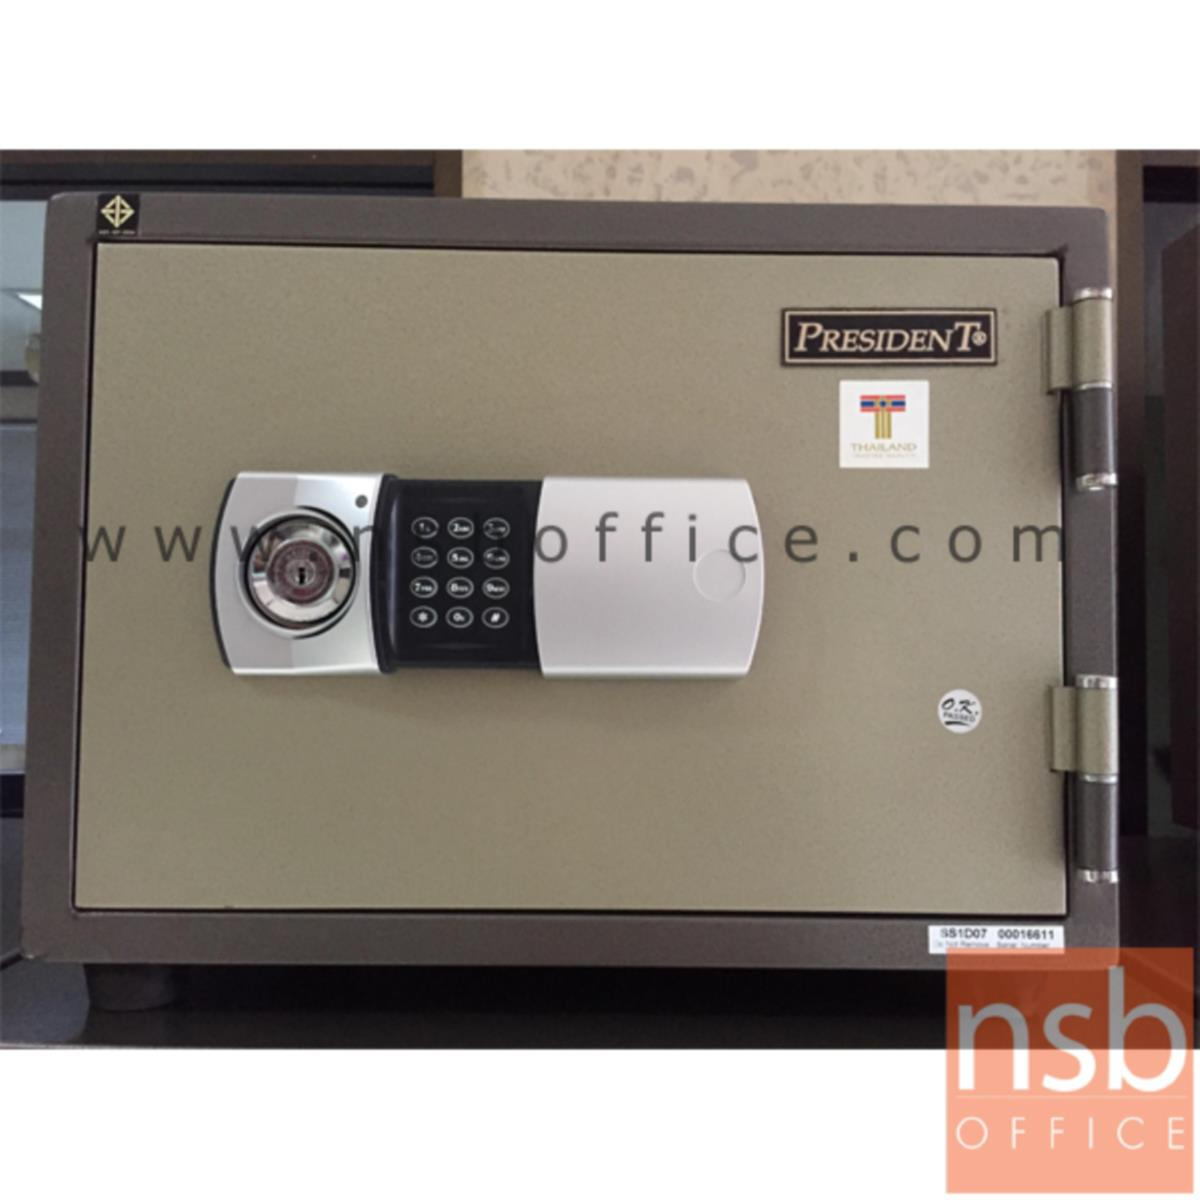 F05A022:ตู้เซฟนิรภัยชนิดดิจิตอล 50 กก.  รุ่น PRESIDENT-SS1D มี 1 กุญแจ 1 รหัส (รหัสใช้กดหน้าตู้)